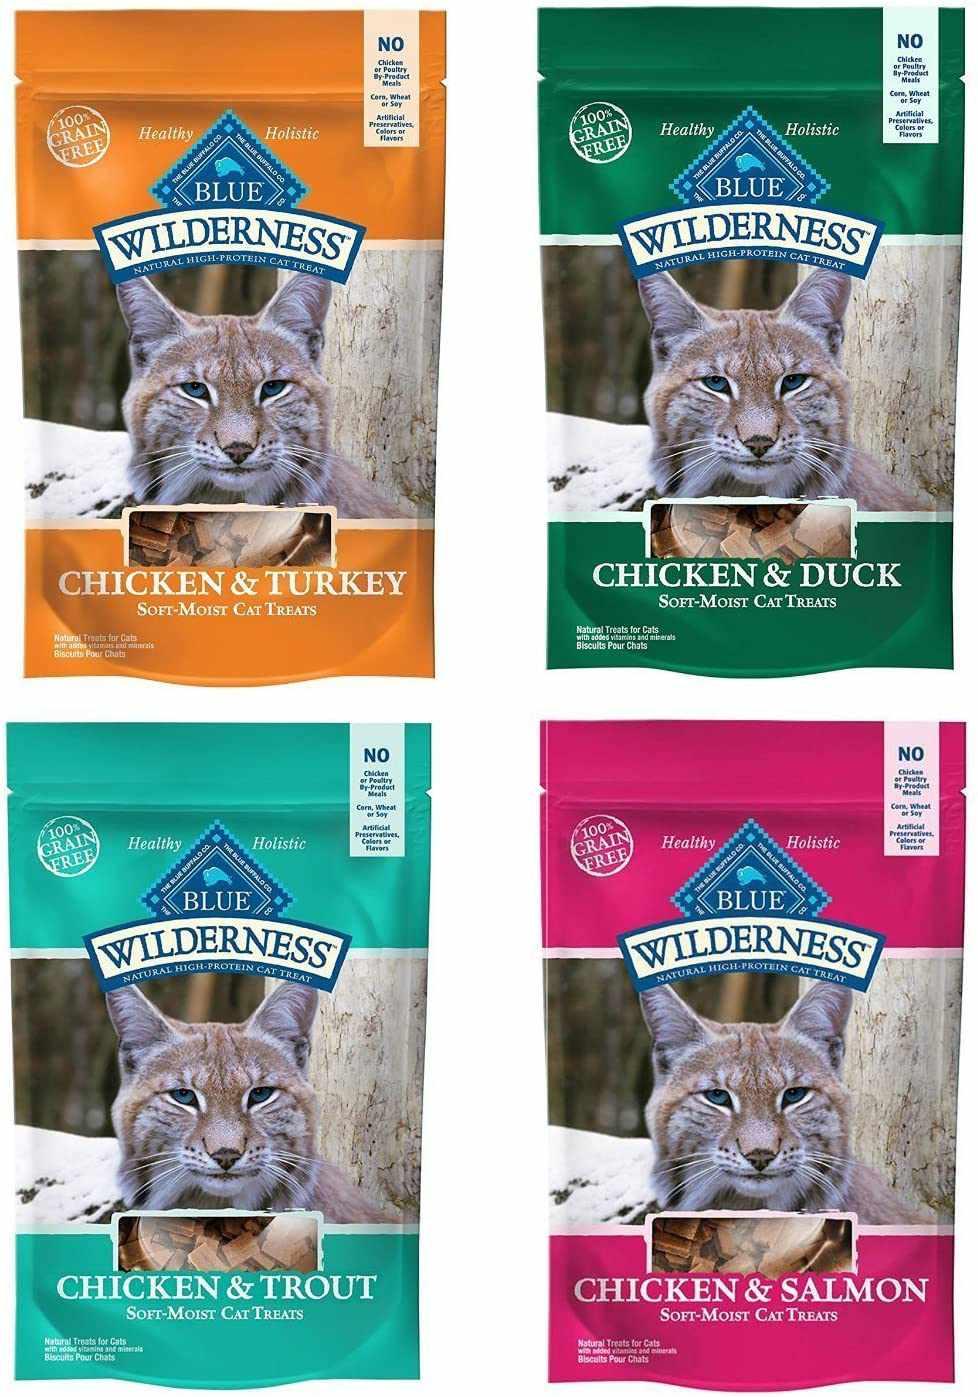 Blue Wilderness Soft-Moist Grain-Free Cat Treats Variety Pack